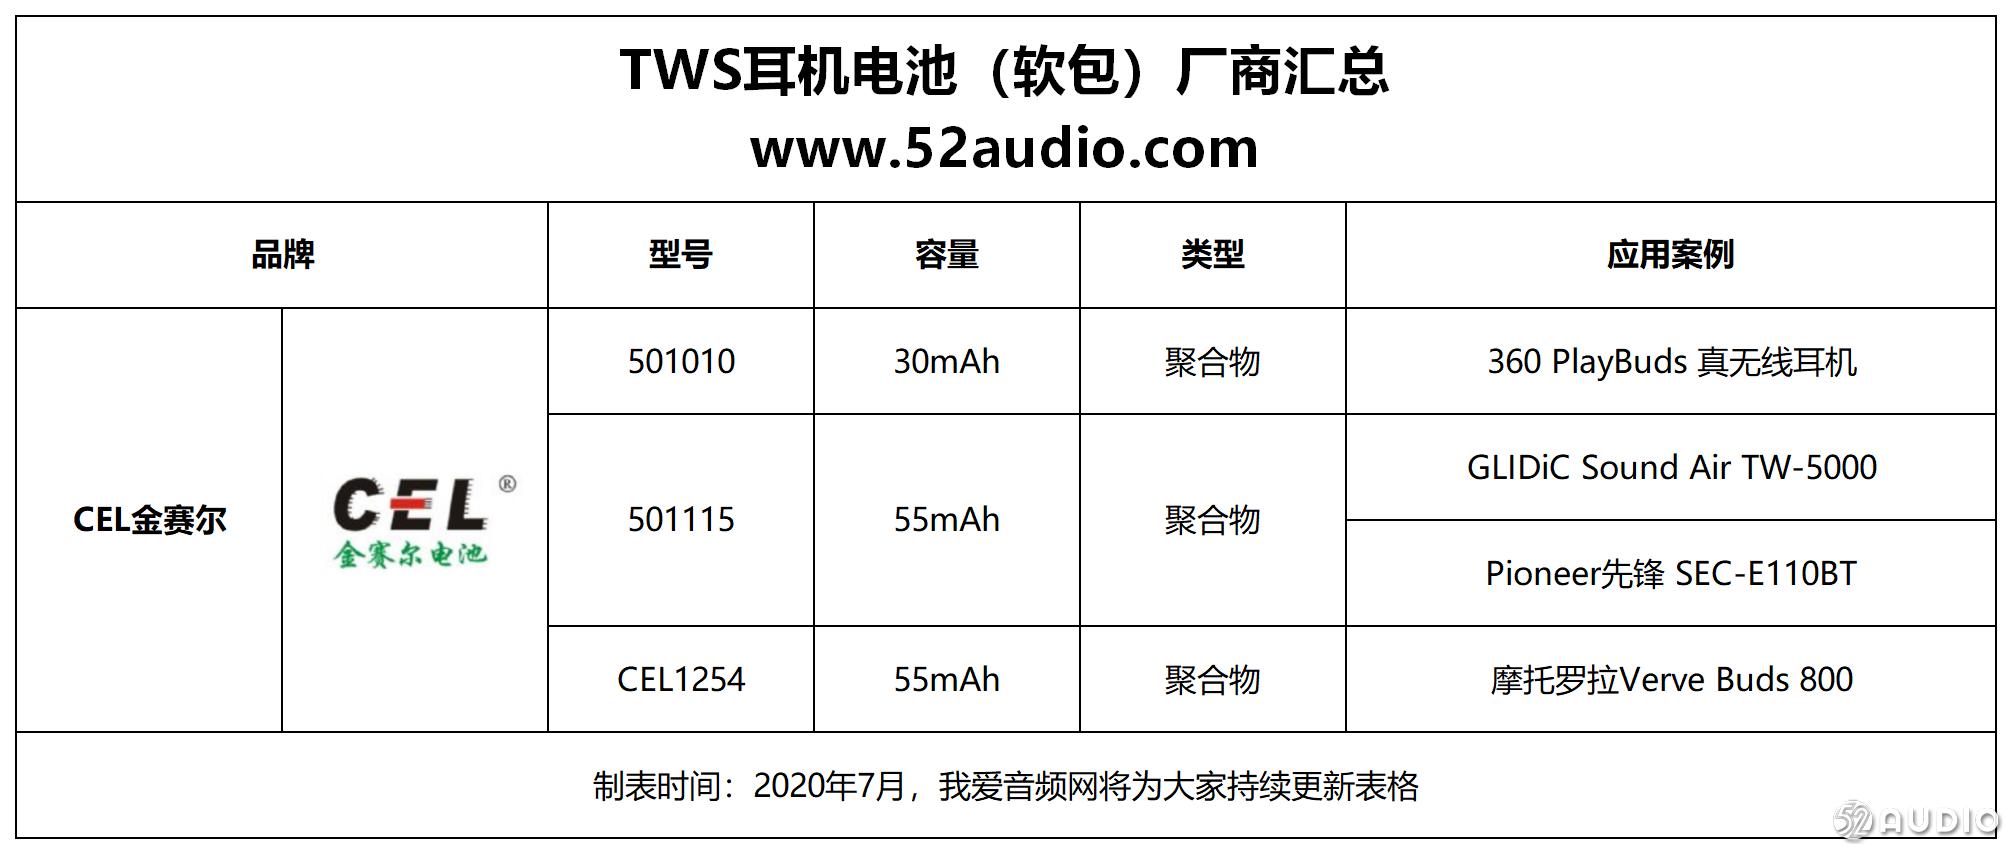 TWS耳机聚合物软包电池需求暴增:13家厂商赚翻了-我爱音频网